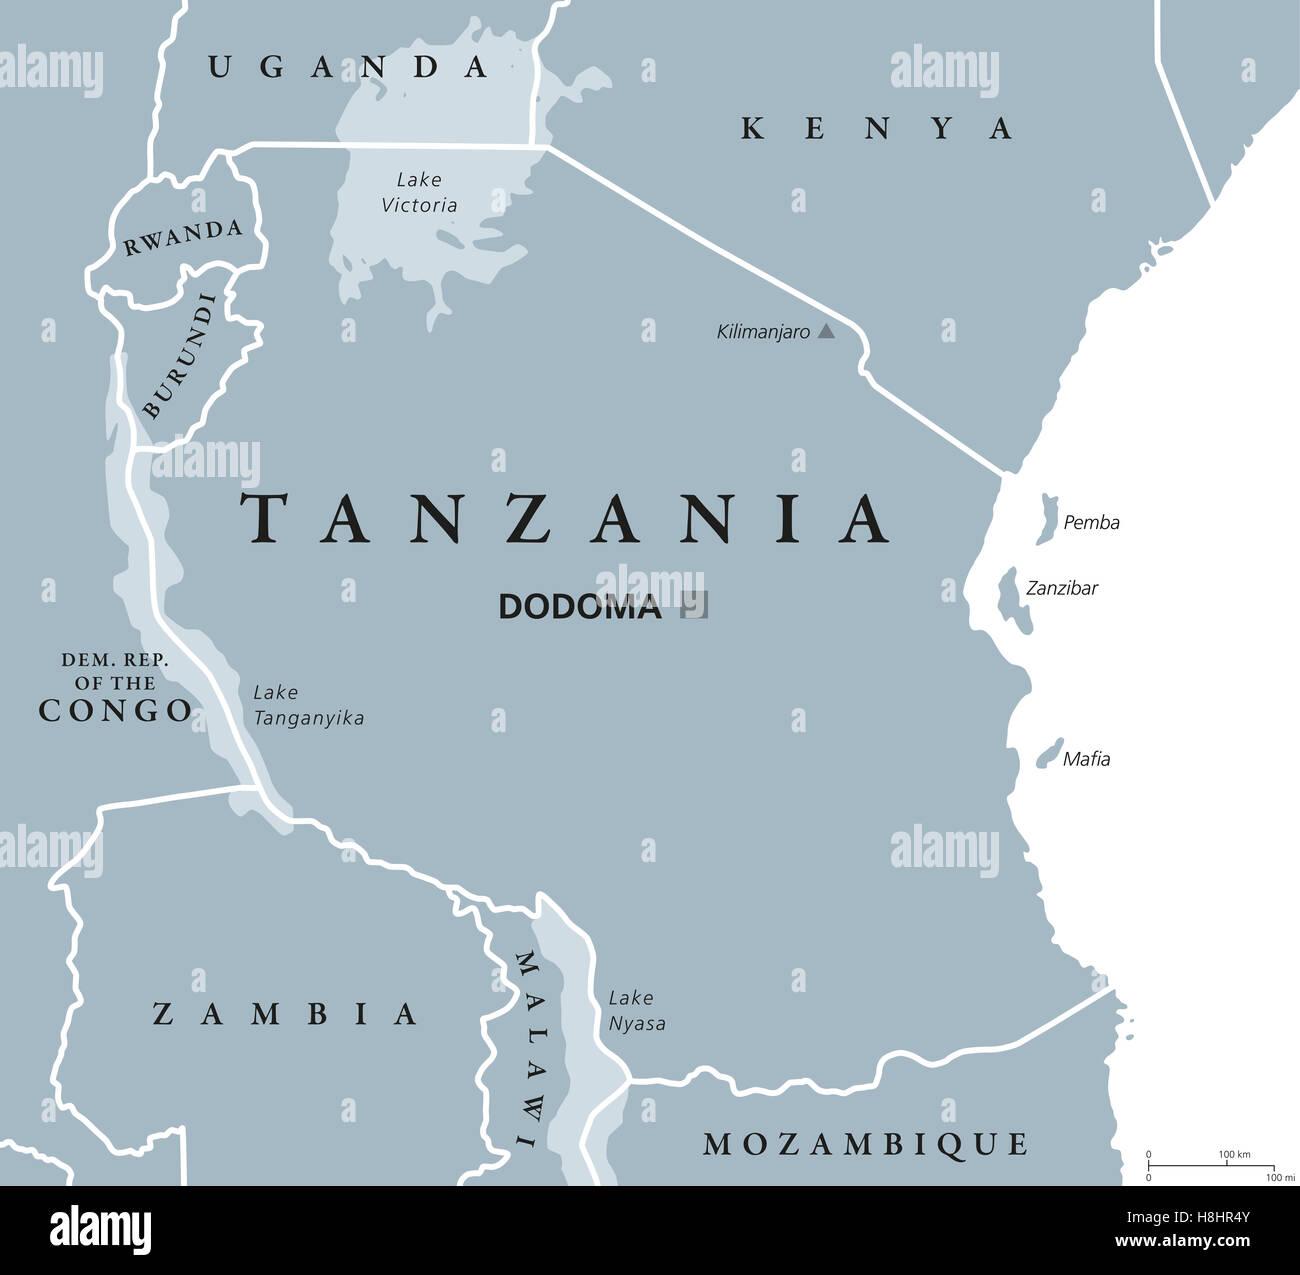 Tanzania political map with capital Dodoma, national borders, islands Zanzibar, Pemba and neighbor countries. Stock Photo